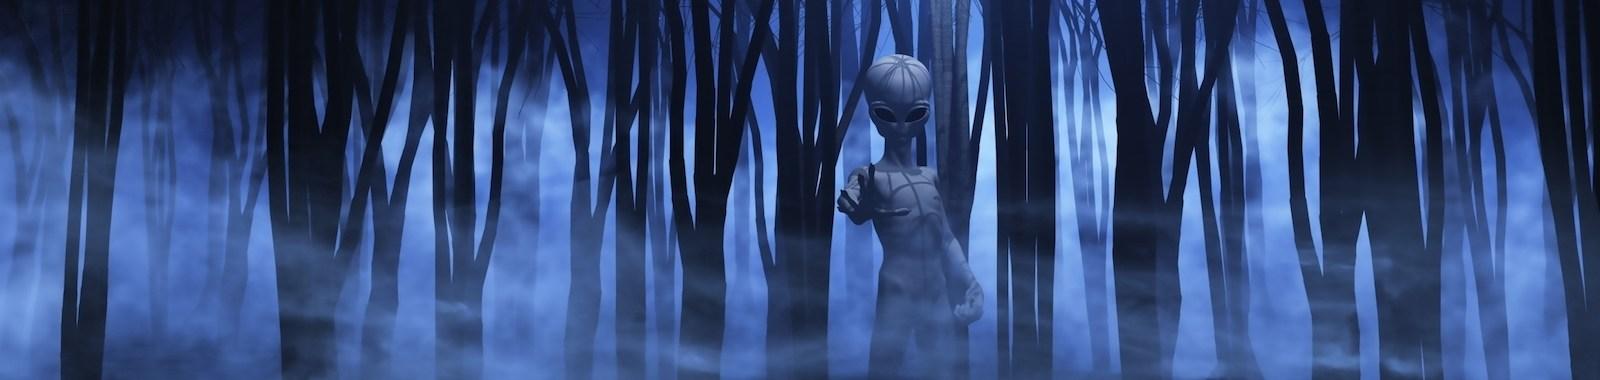 3D render of an alien in a spooky foggy forest